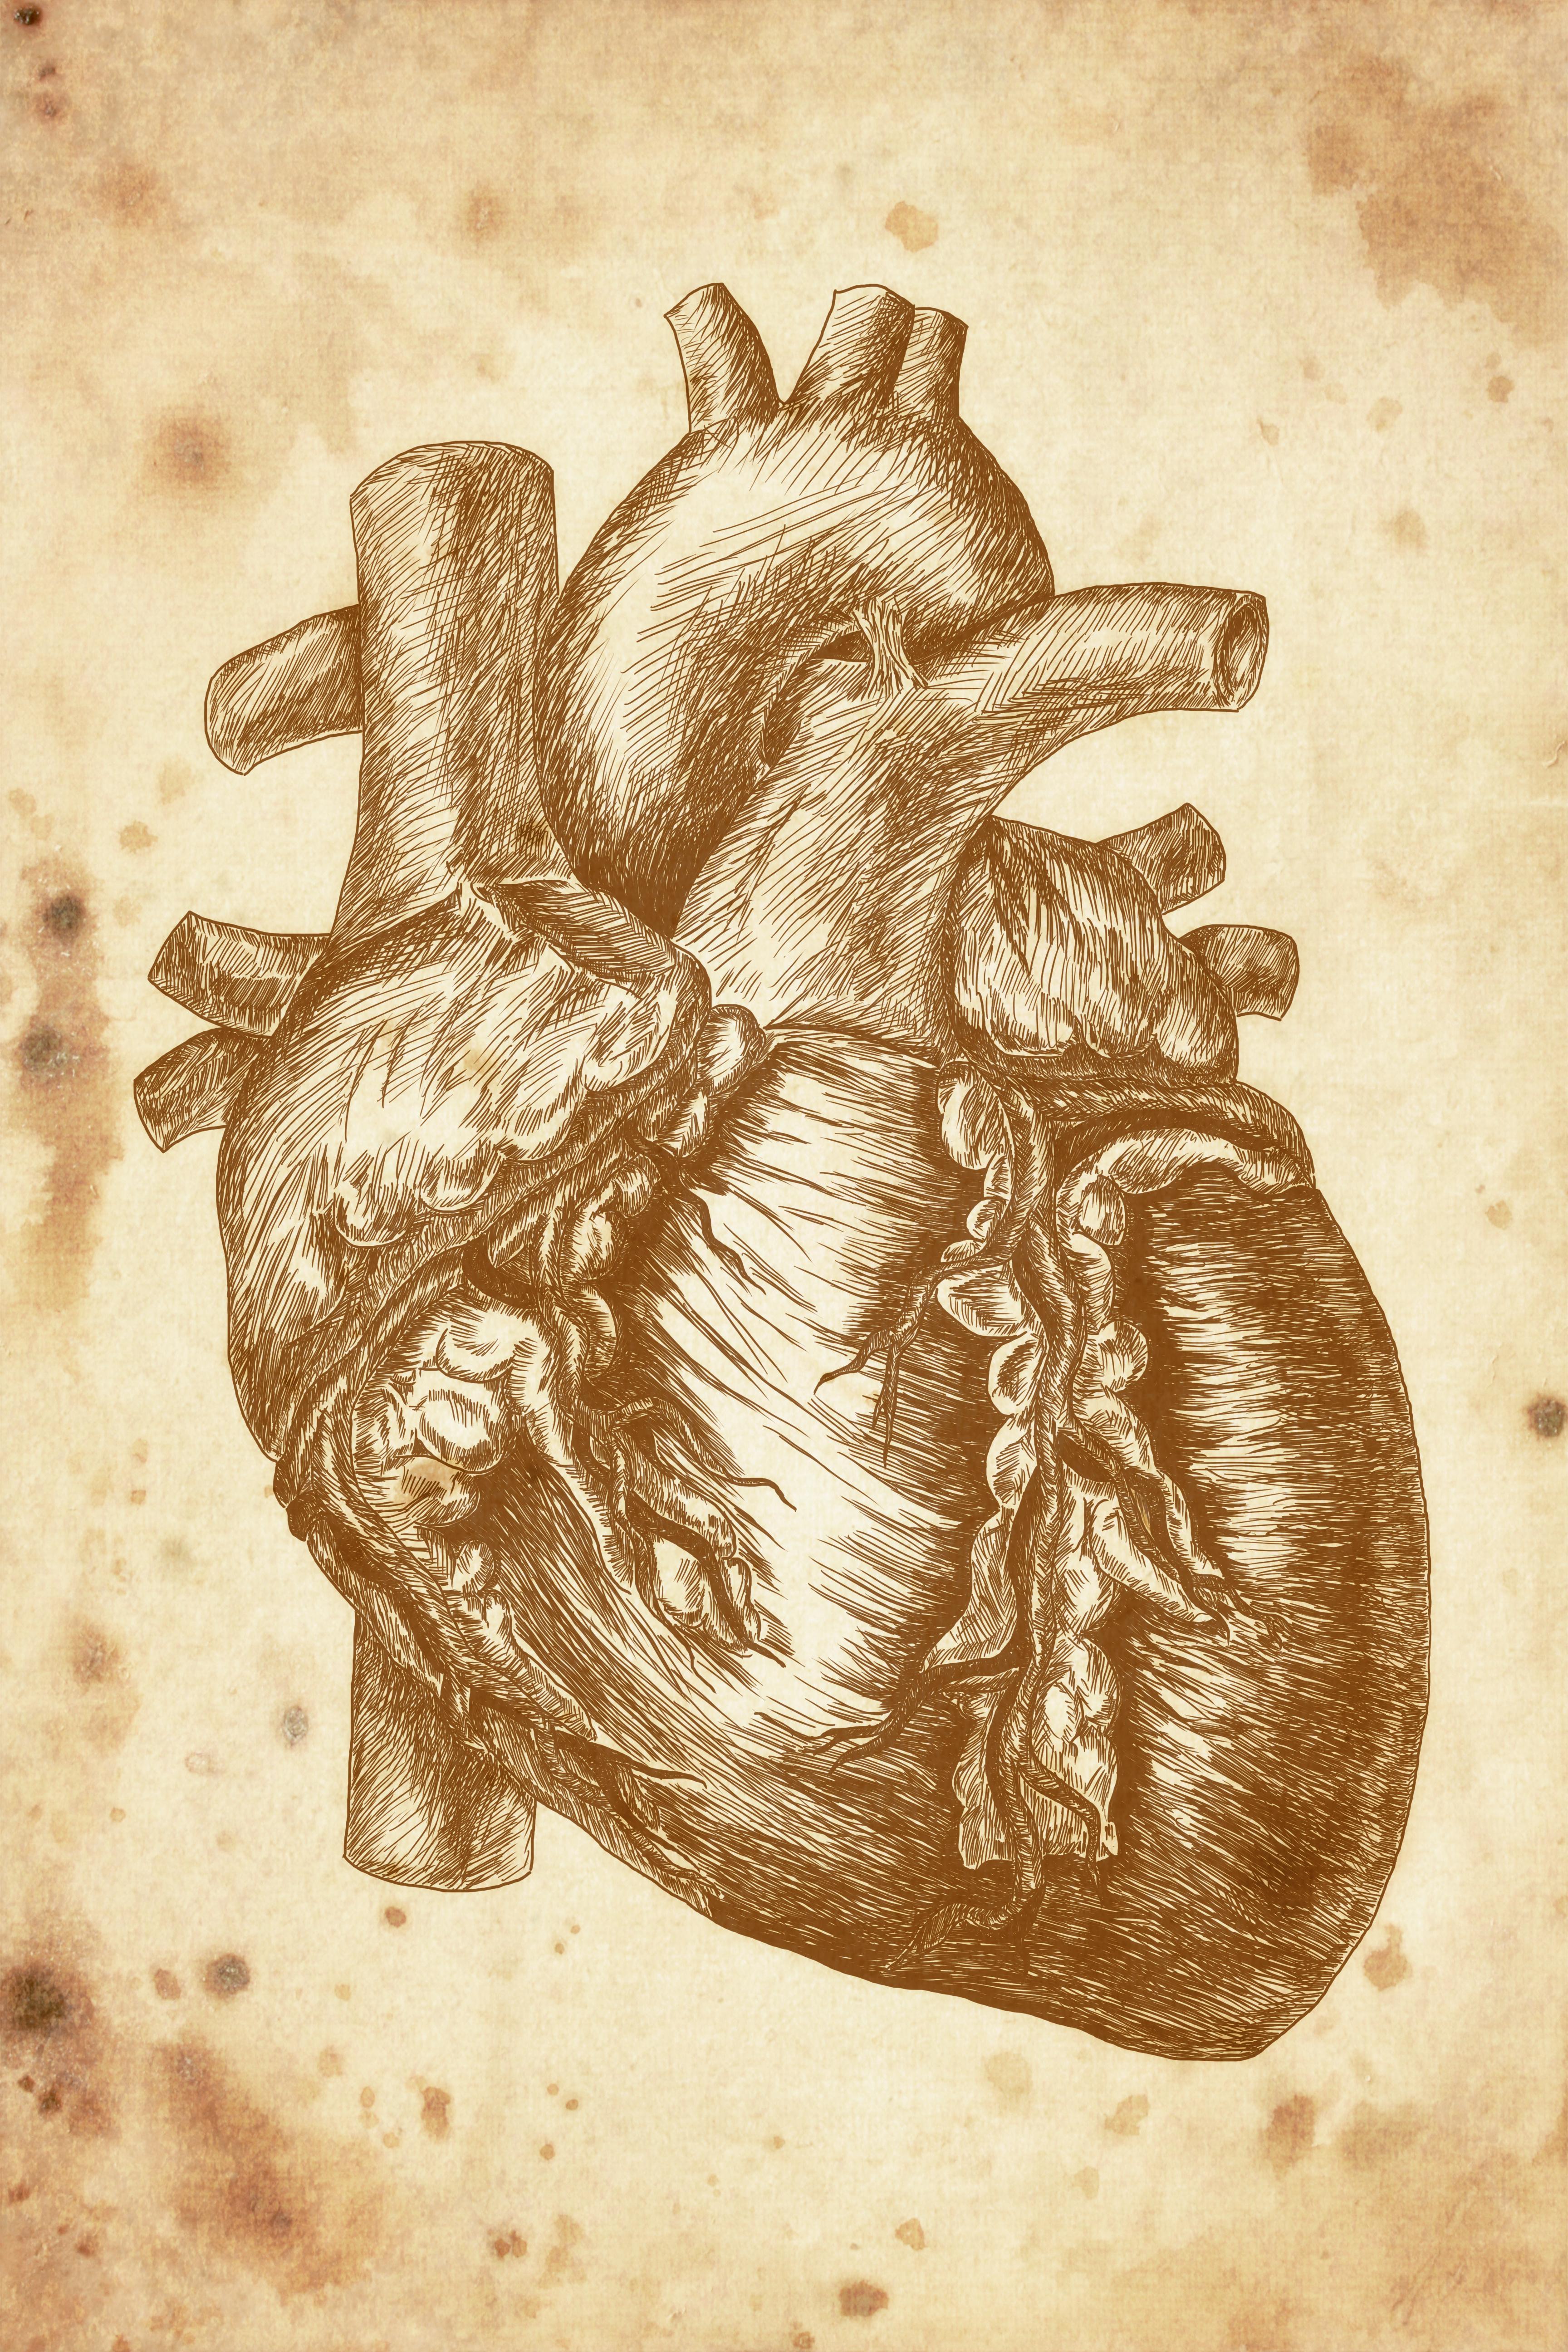 Anatomia serca - fototapeta PIXERS